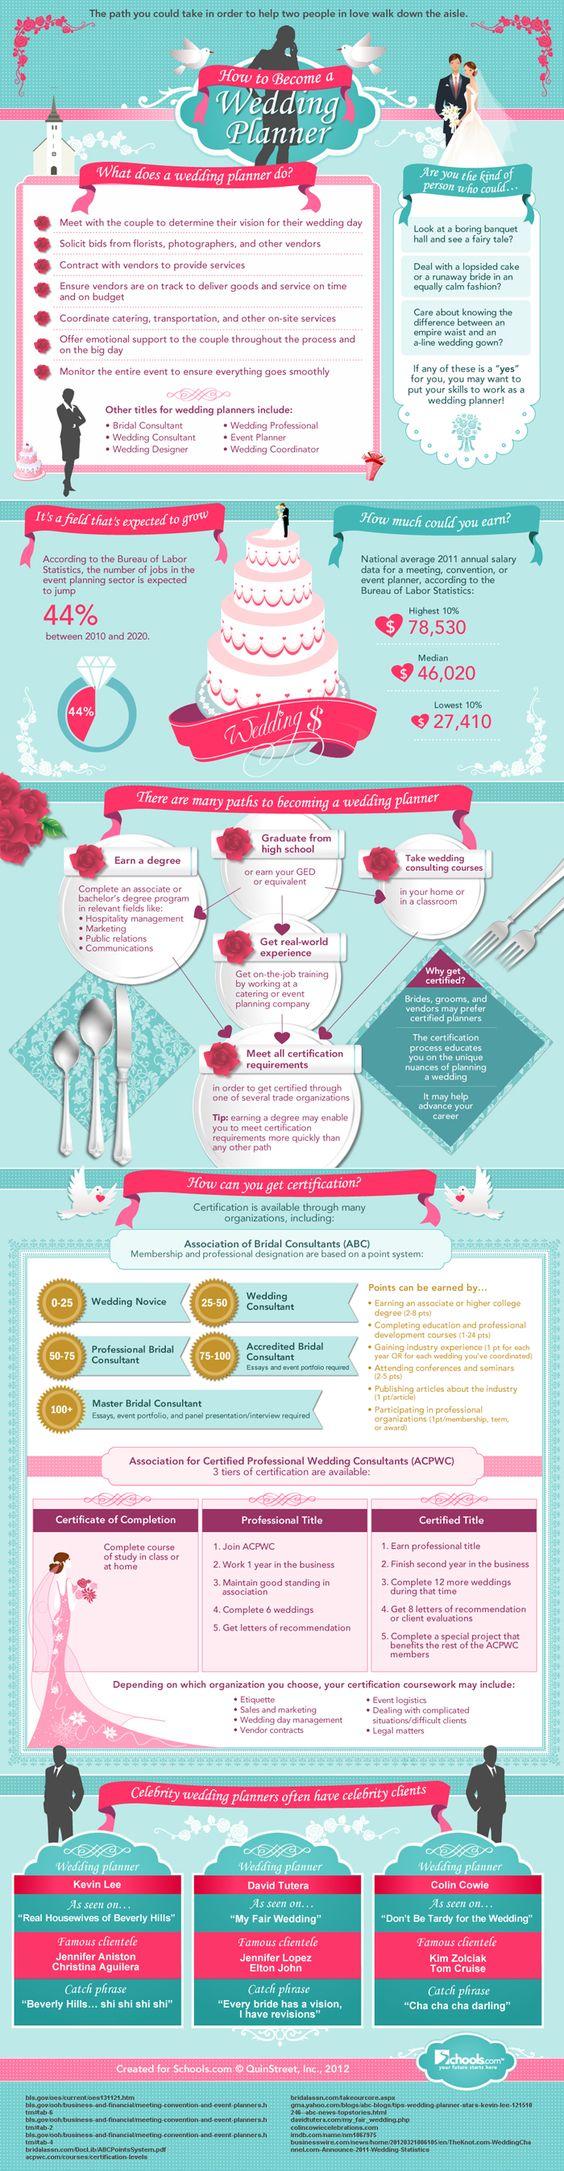 Best 25 Wedding Planner Salary Ideas On Pinterest Checklist Planners And Planning